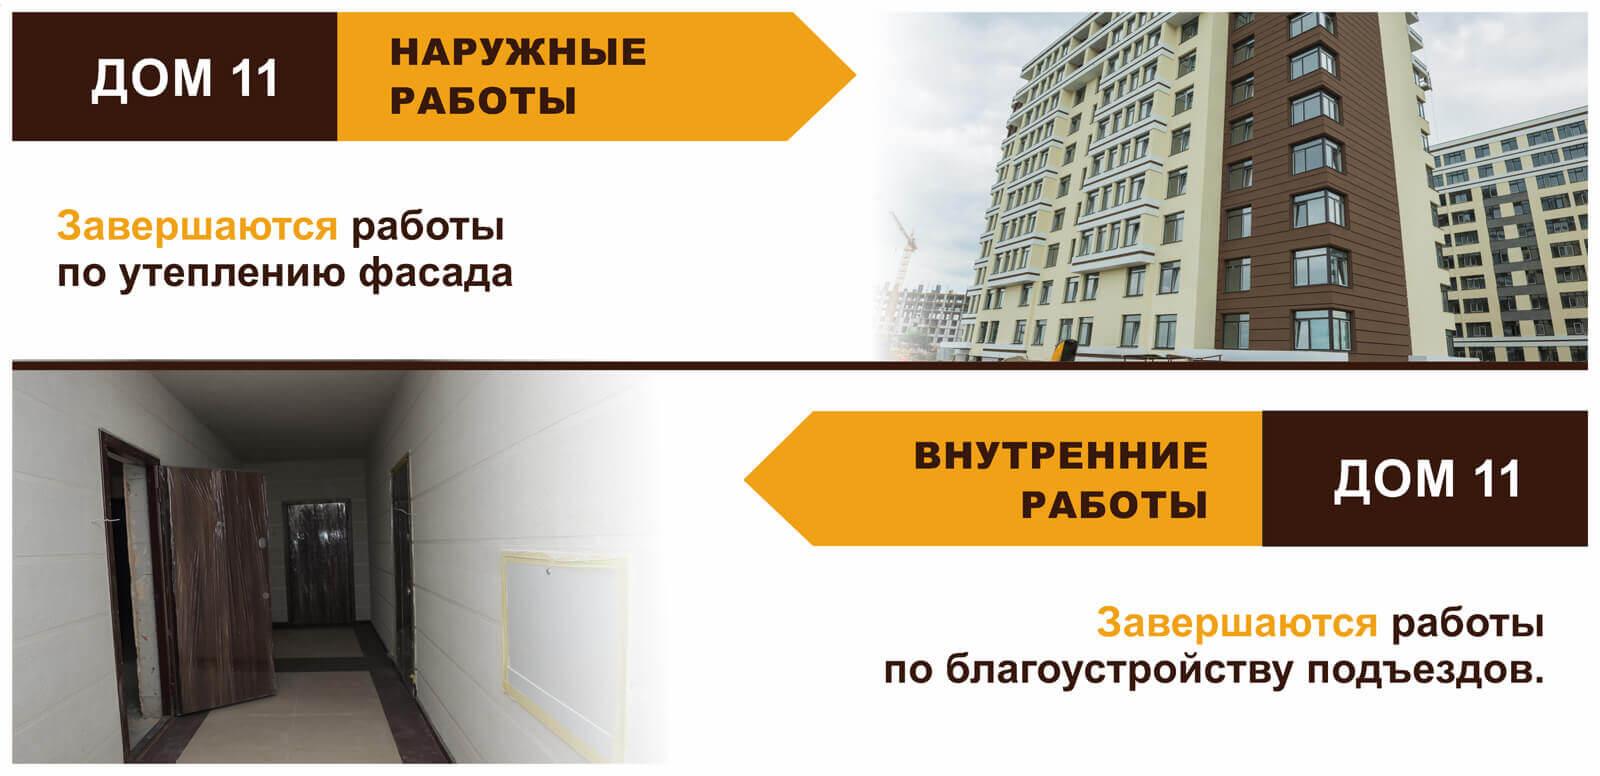 new11-0209-ru